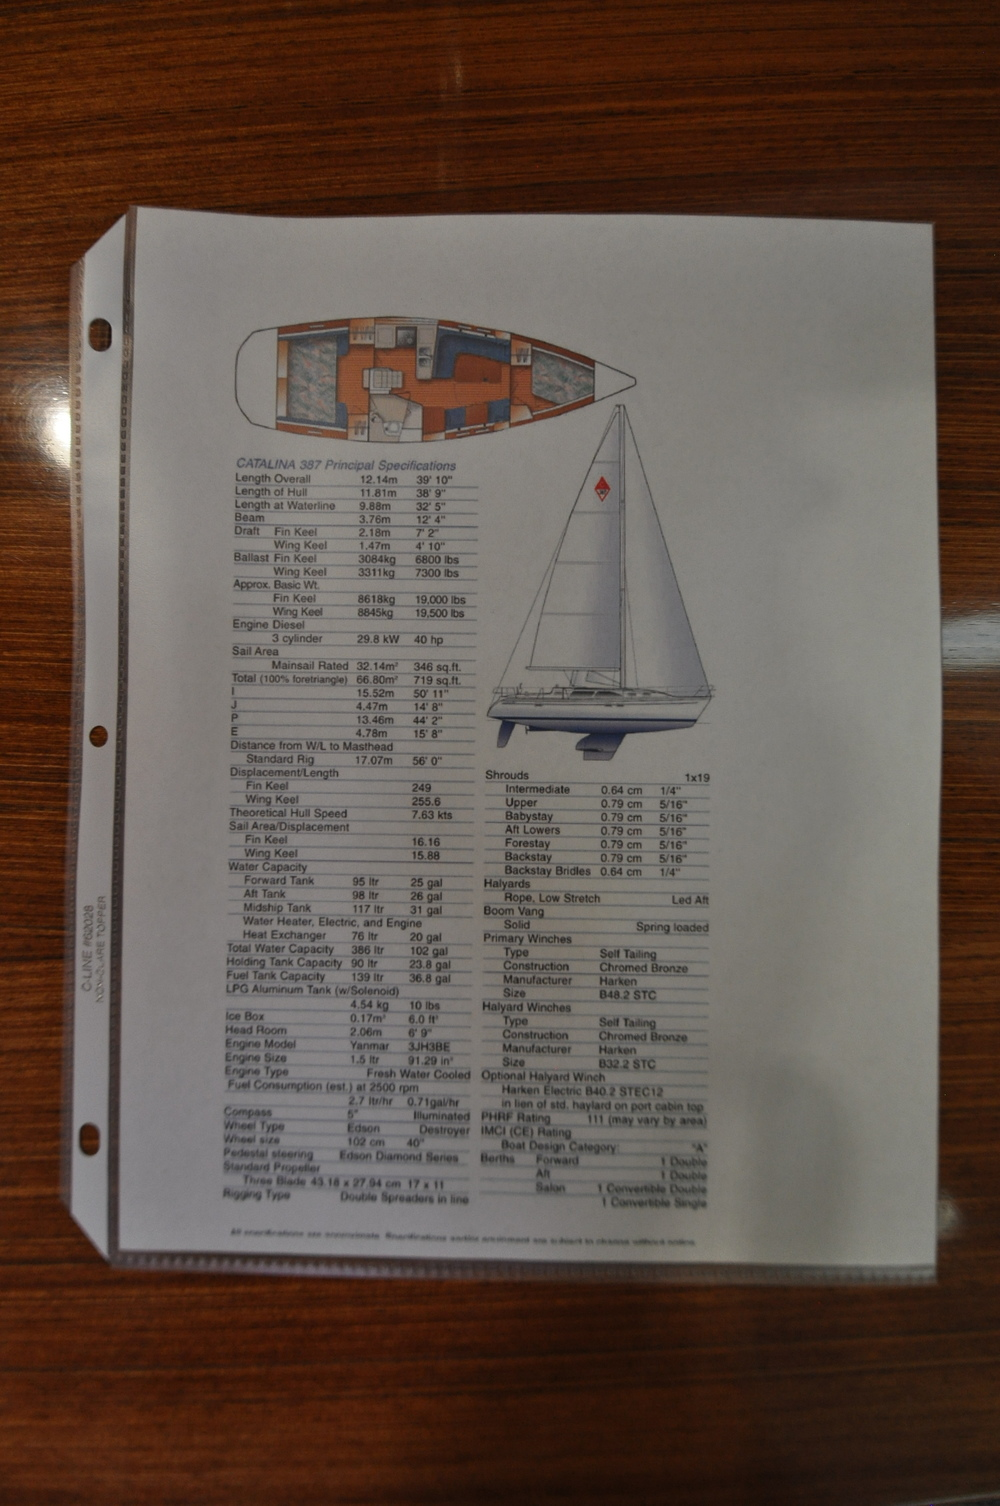 DSC_7433.JPG